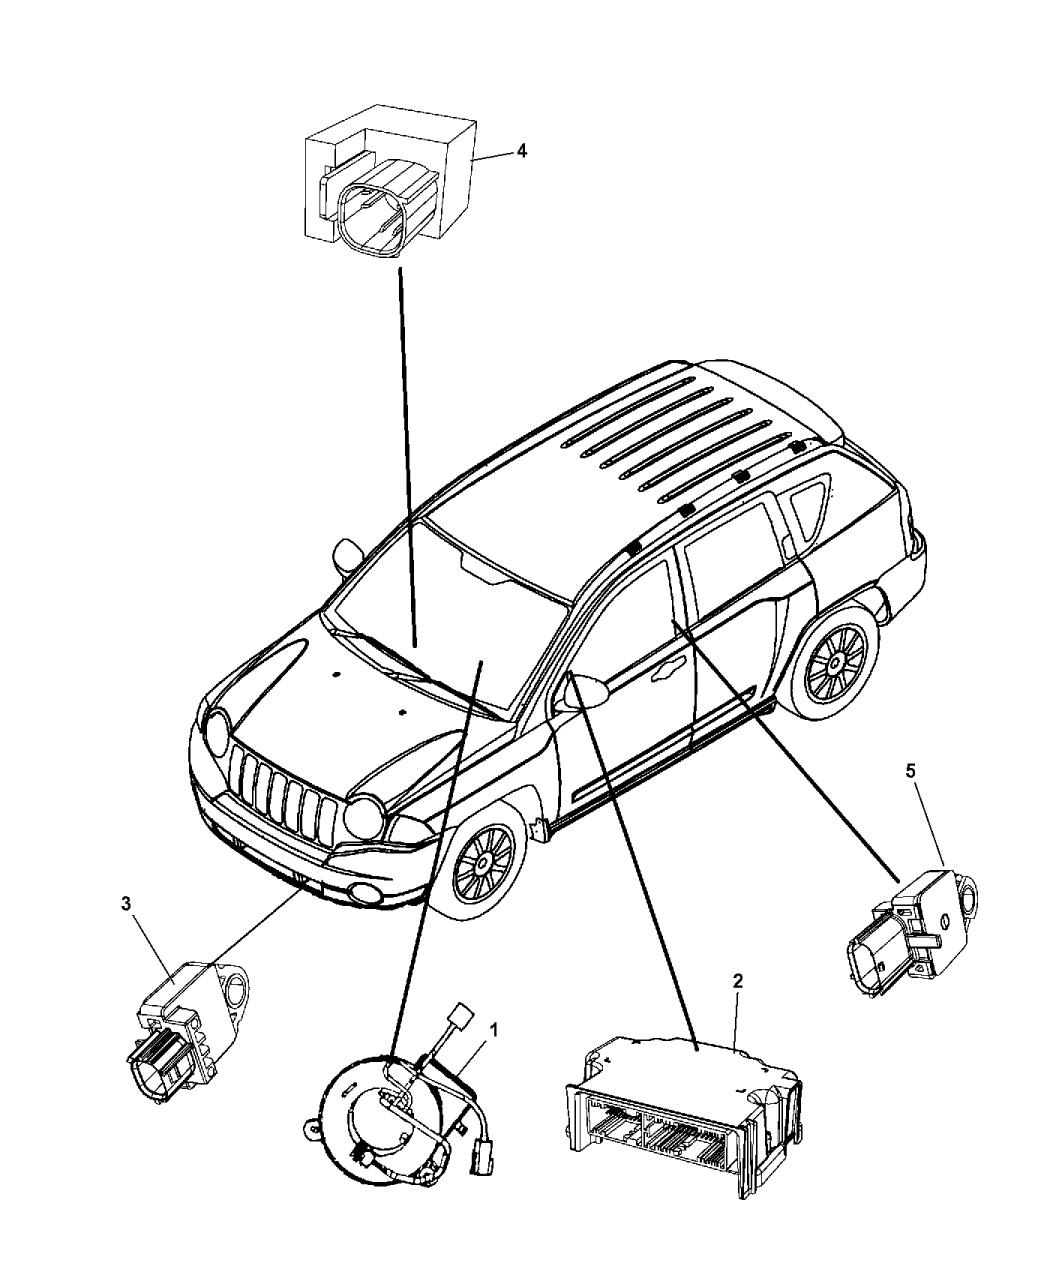 2010 Jeep Compass Air Bag Modules Impact Sensor & Clock